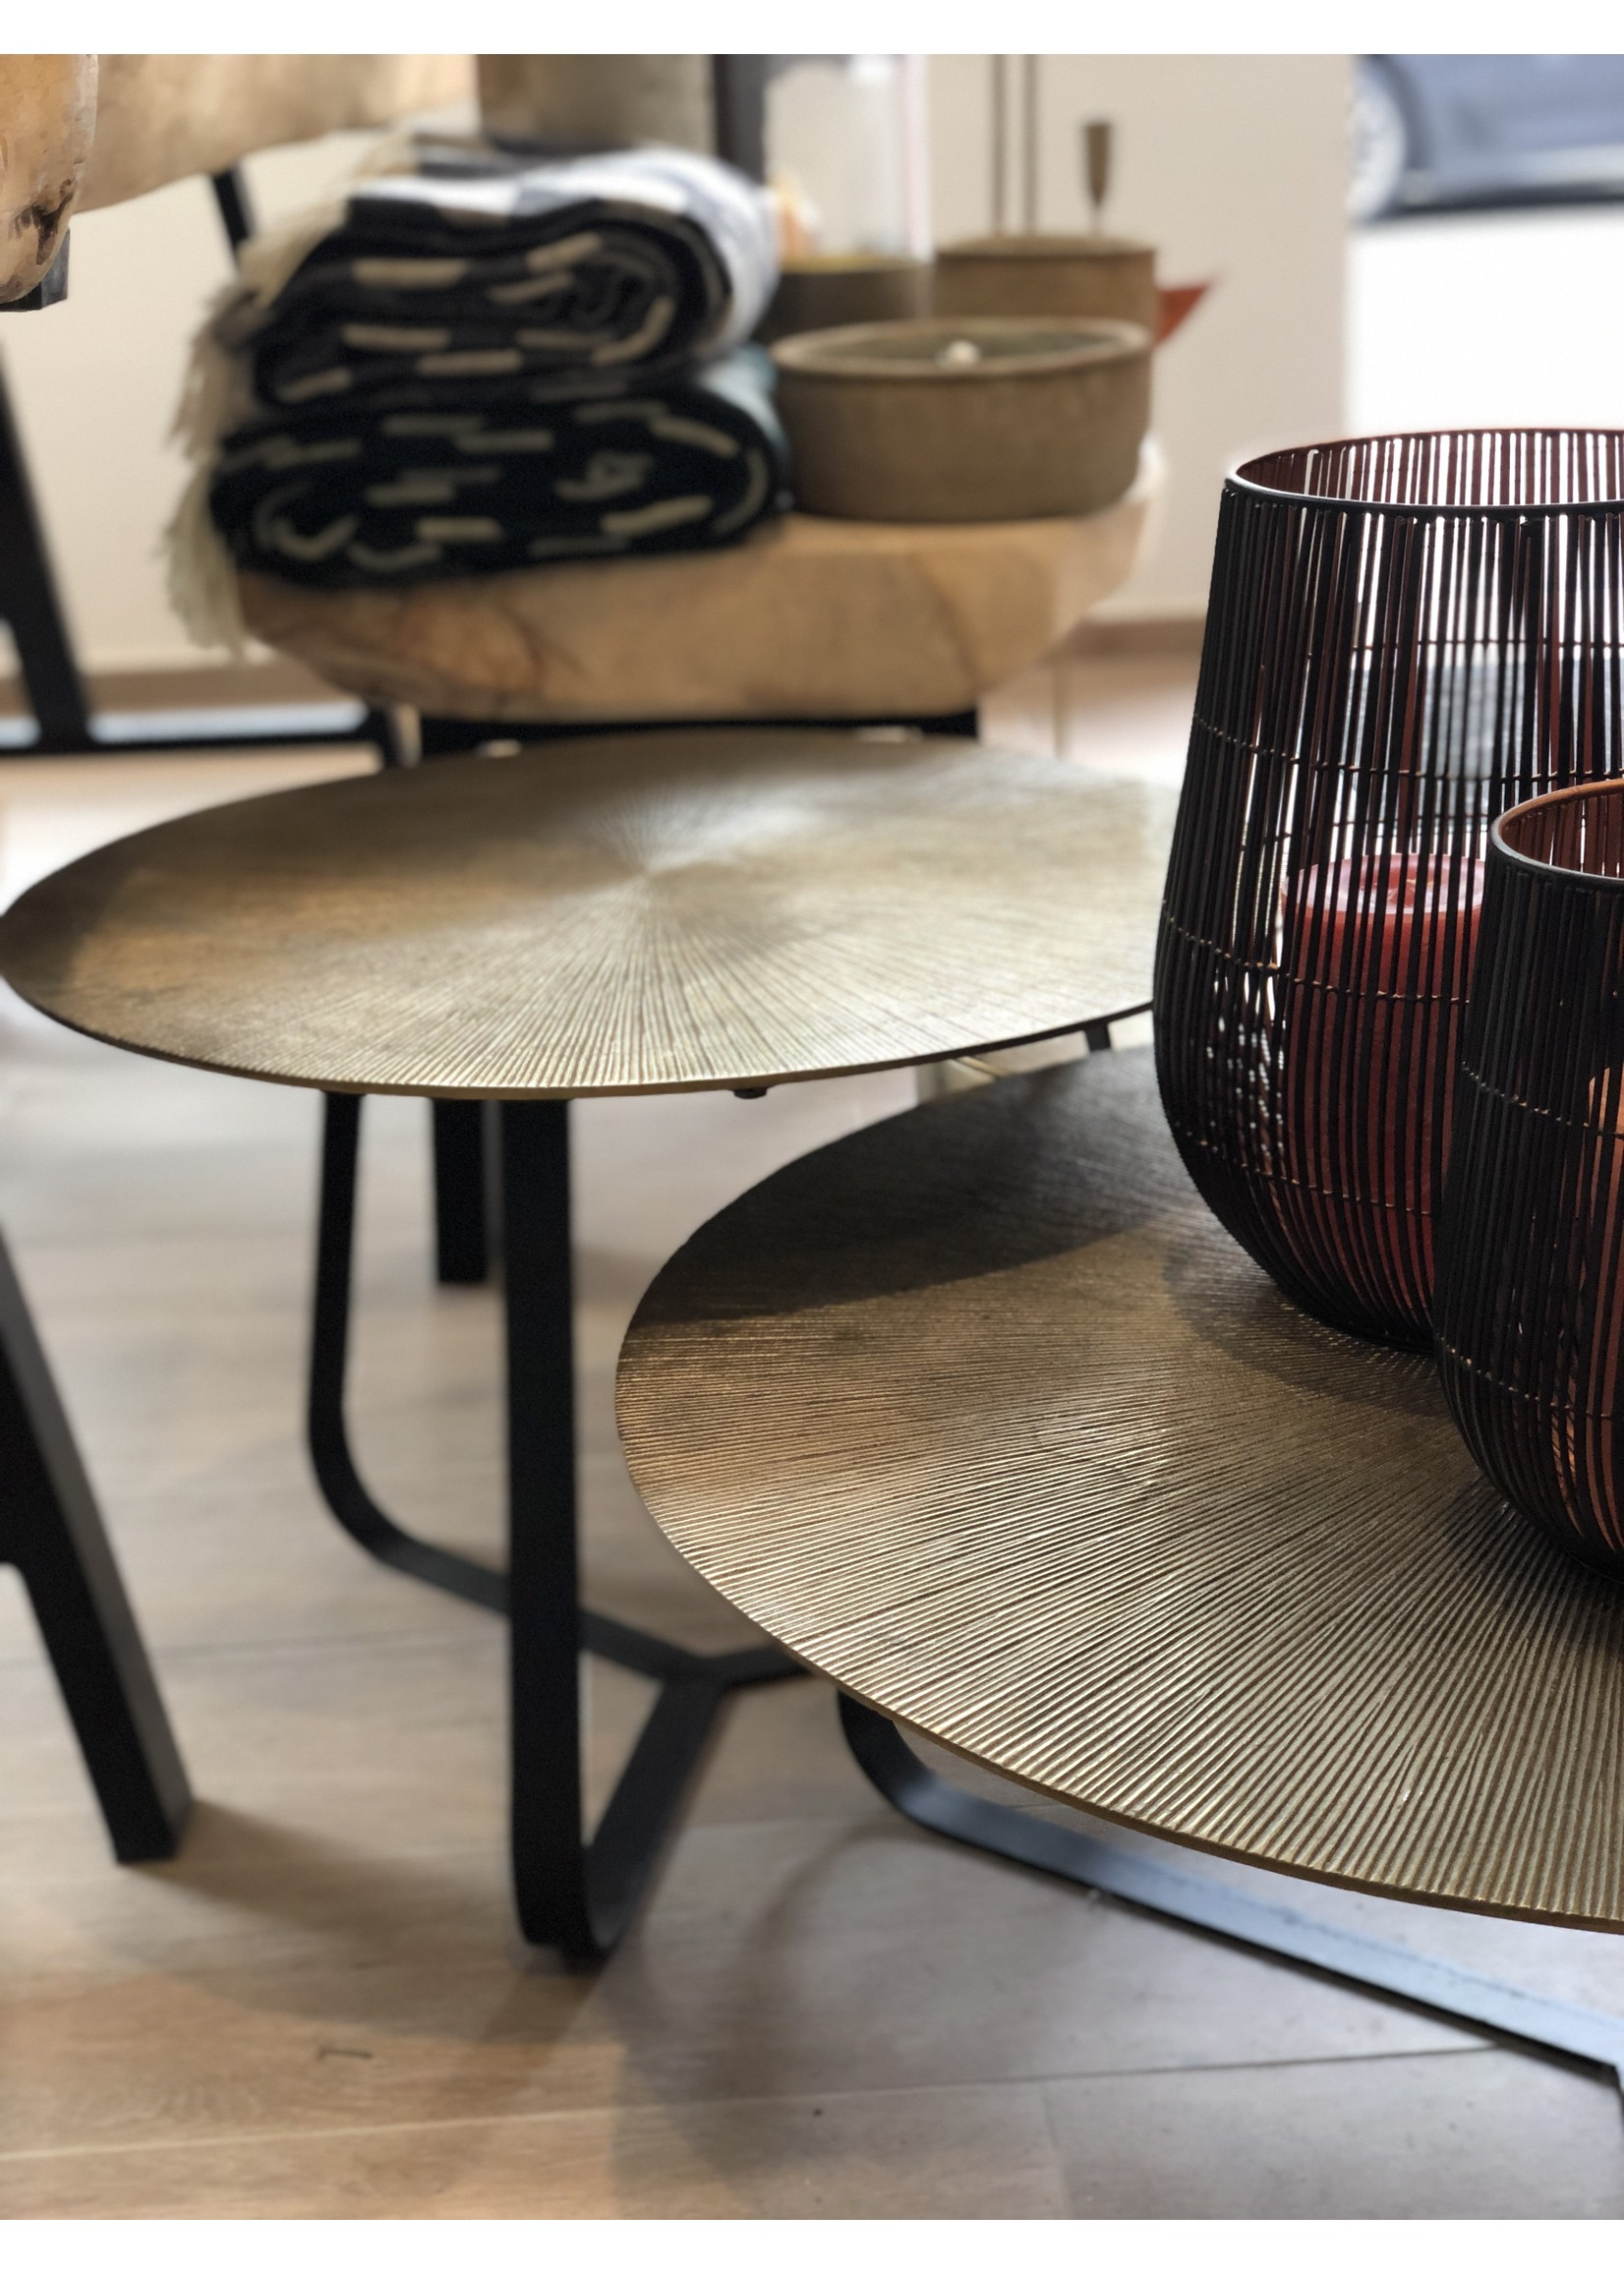 Dekocandle Coffeetable Antique Gold & Black